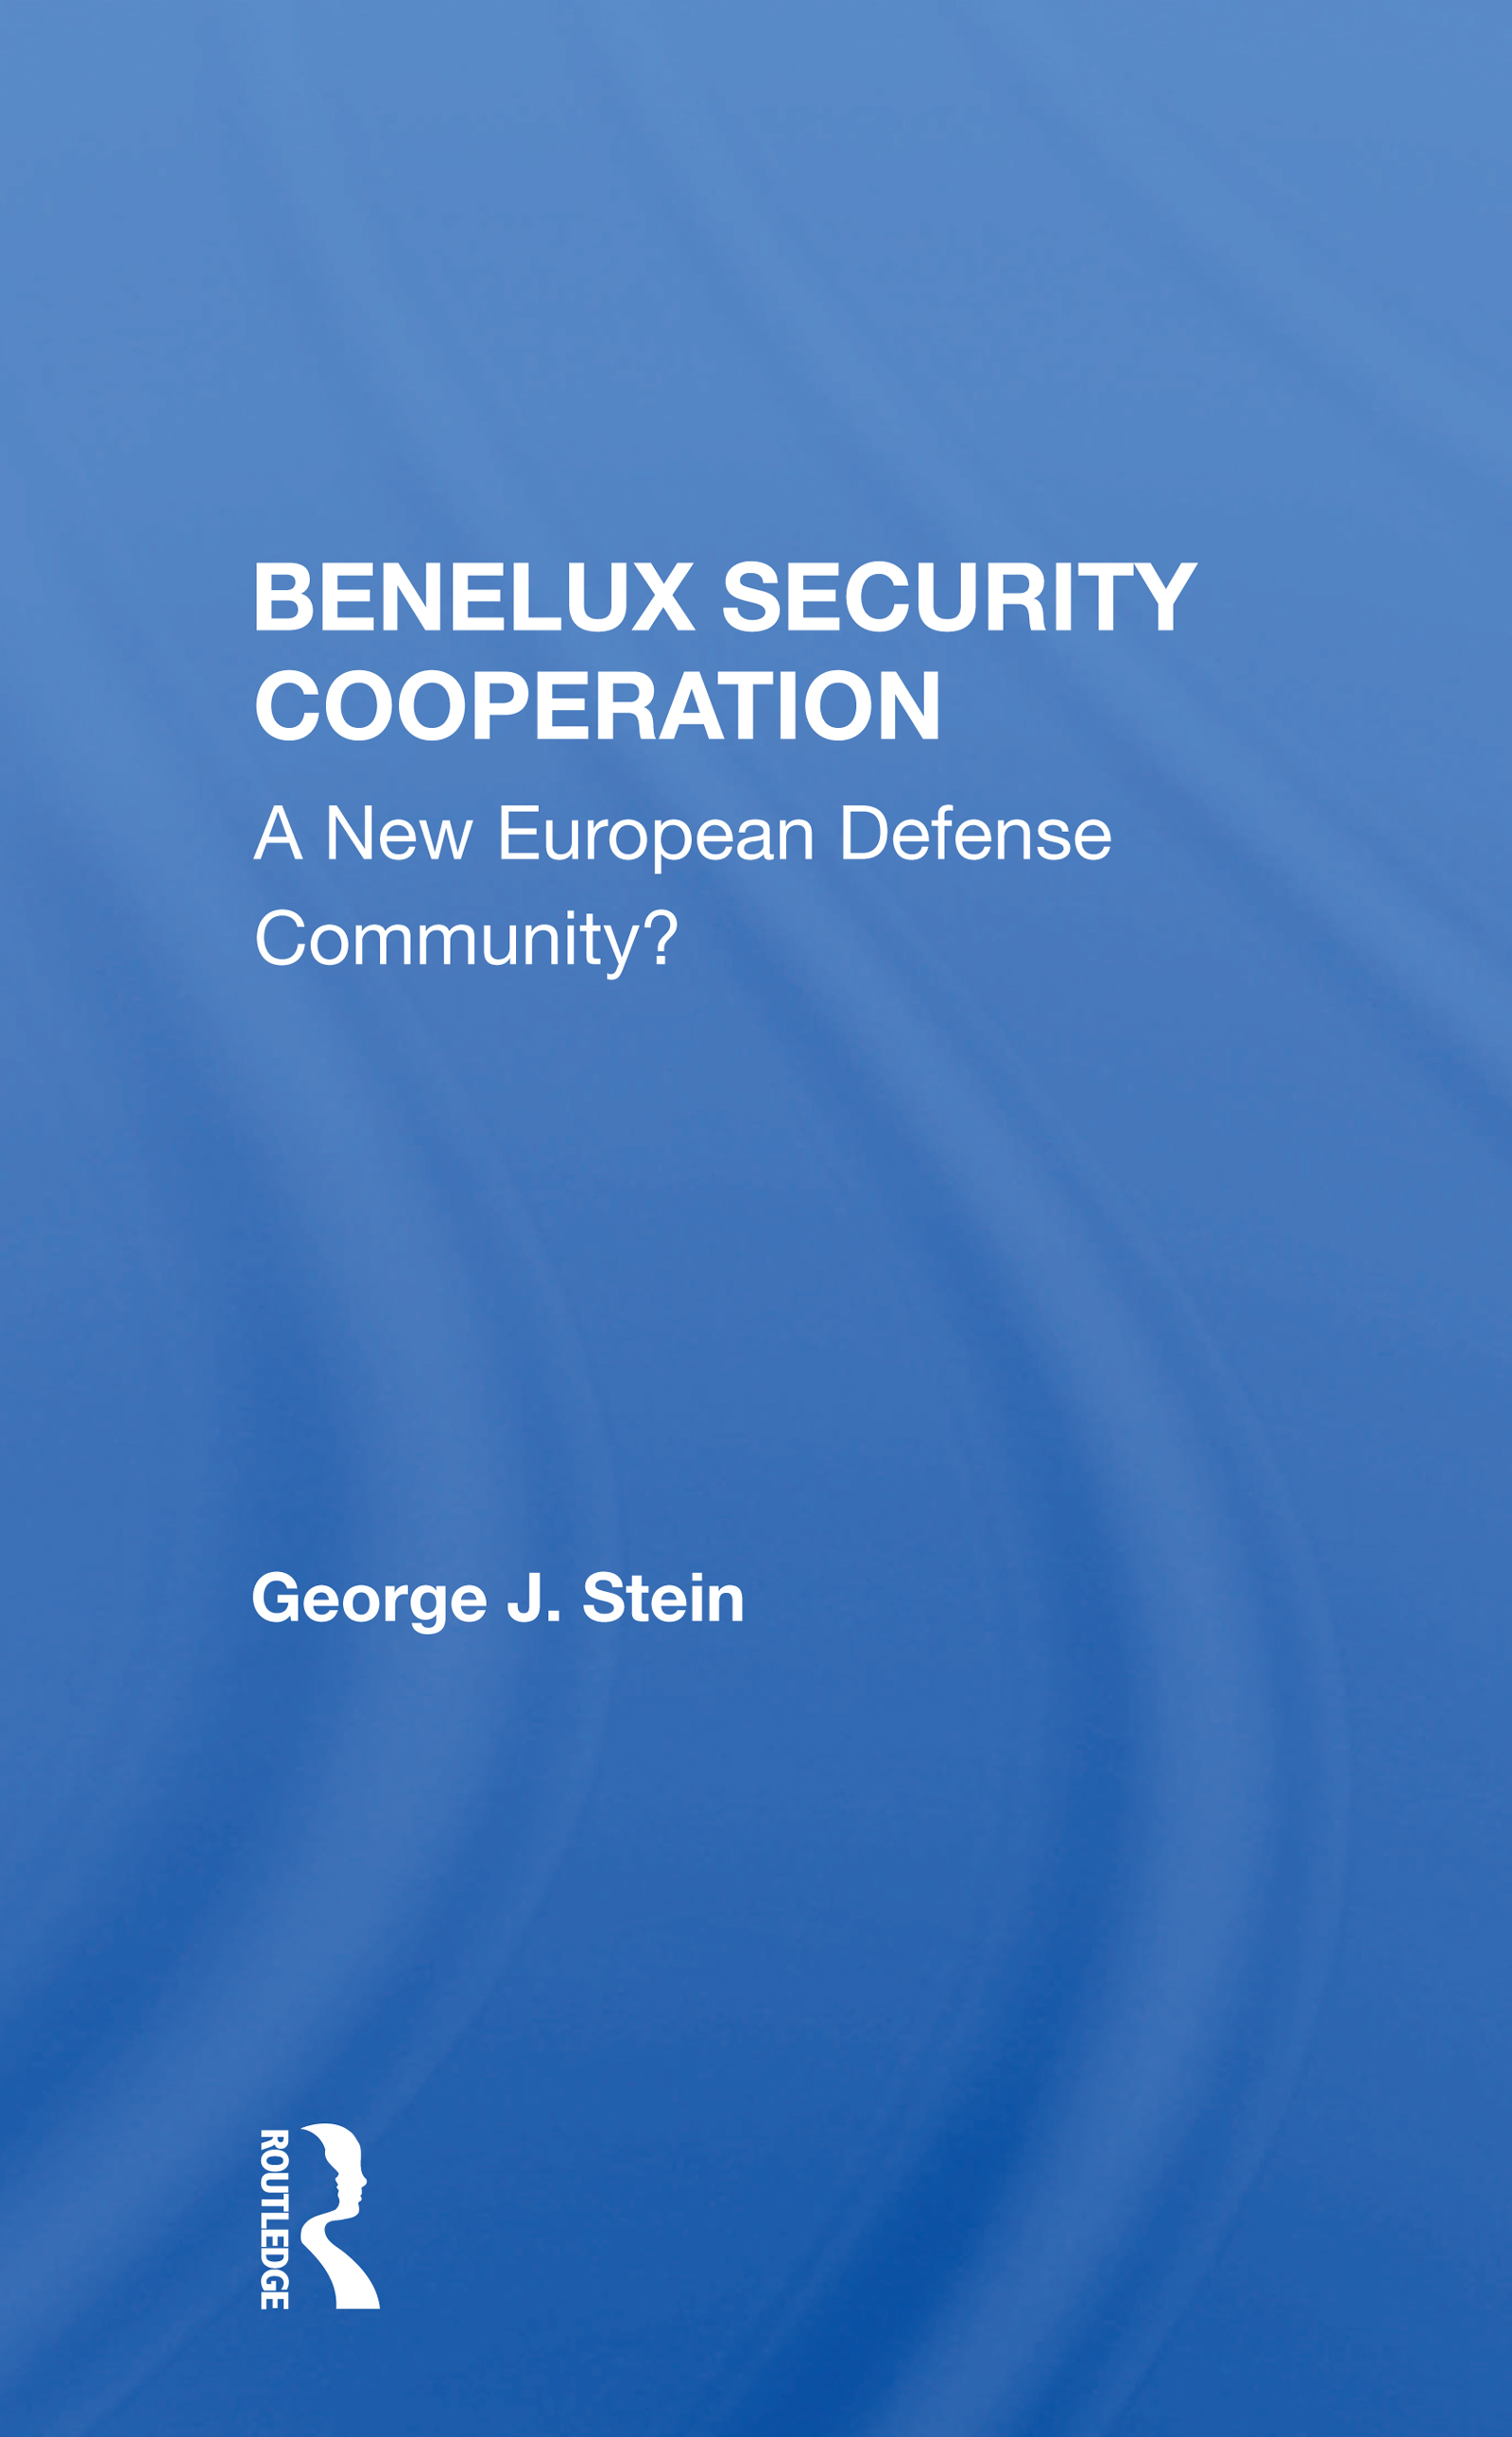 Benelux Security Cooperation